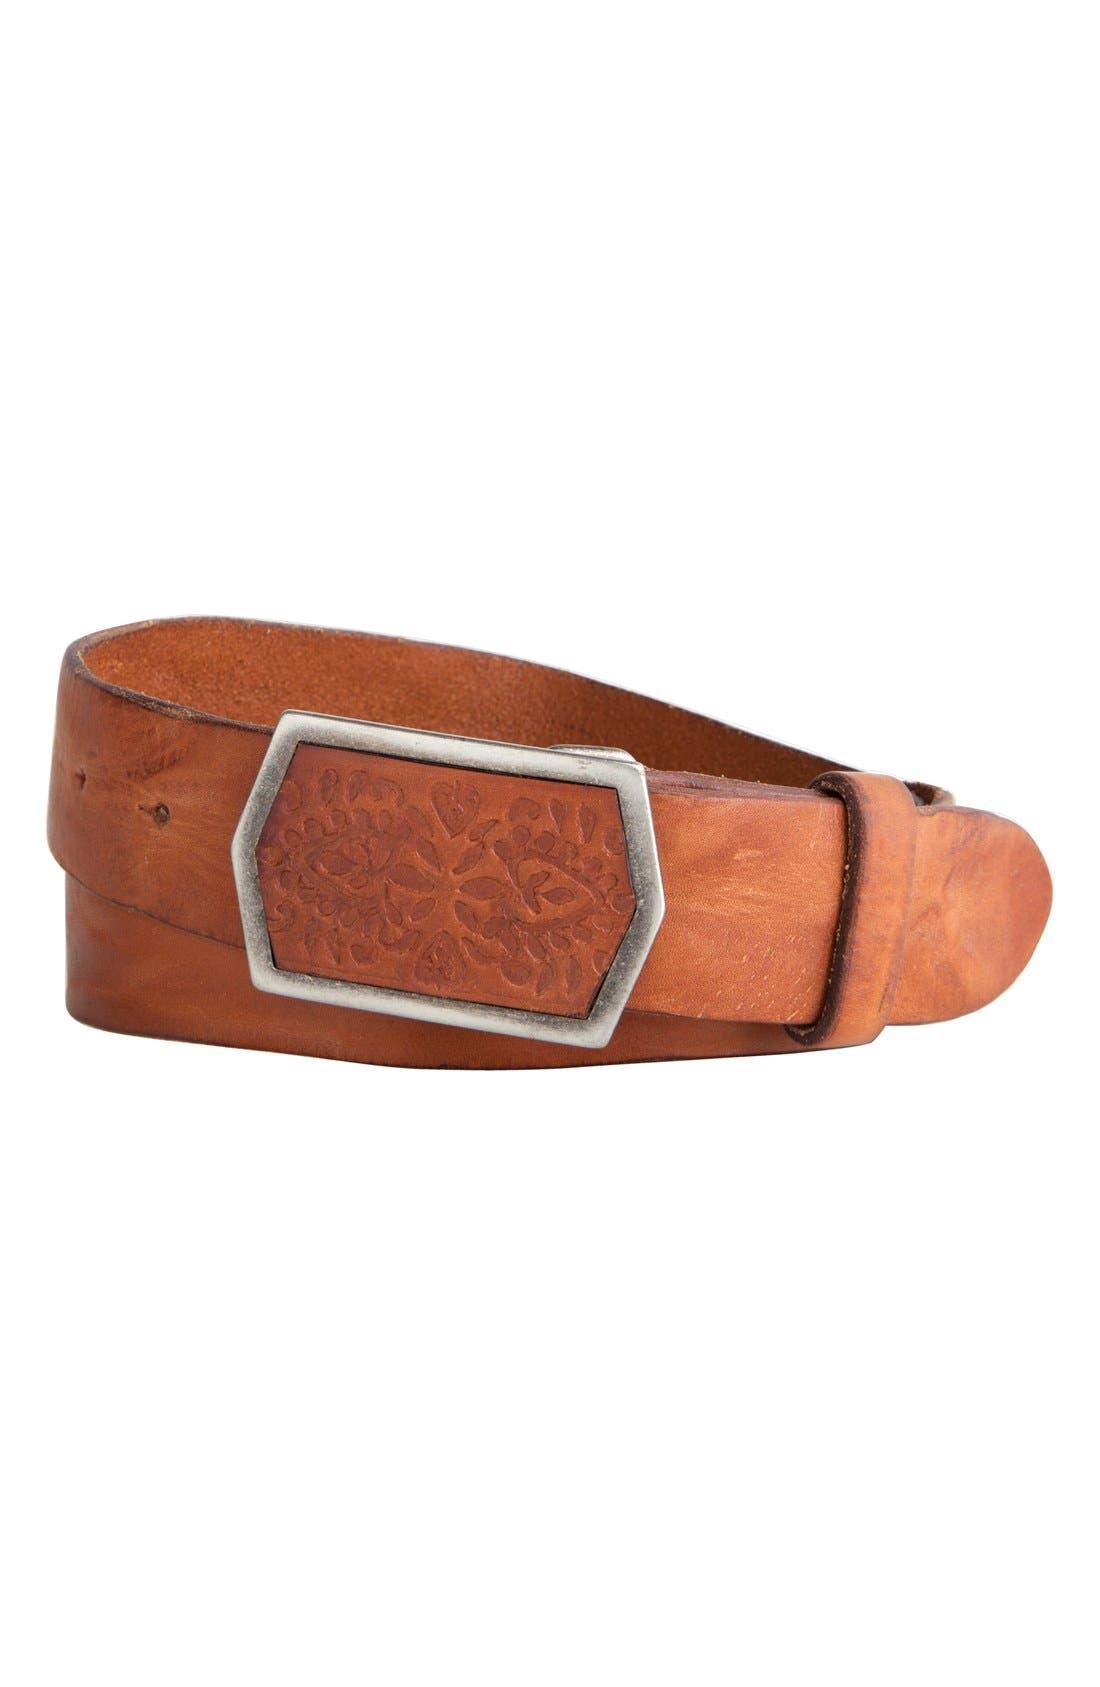 Main Image - Trafalgar 'Tatum' Belt